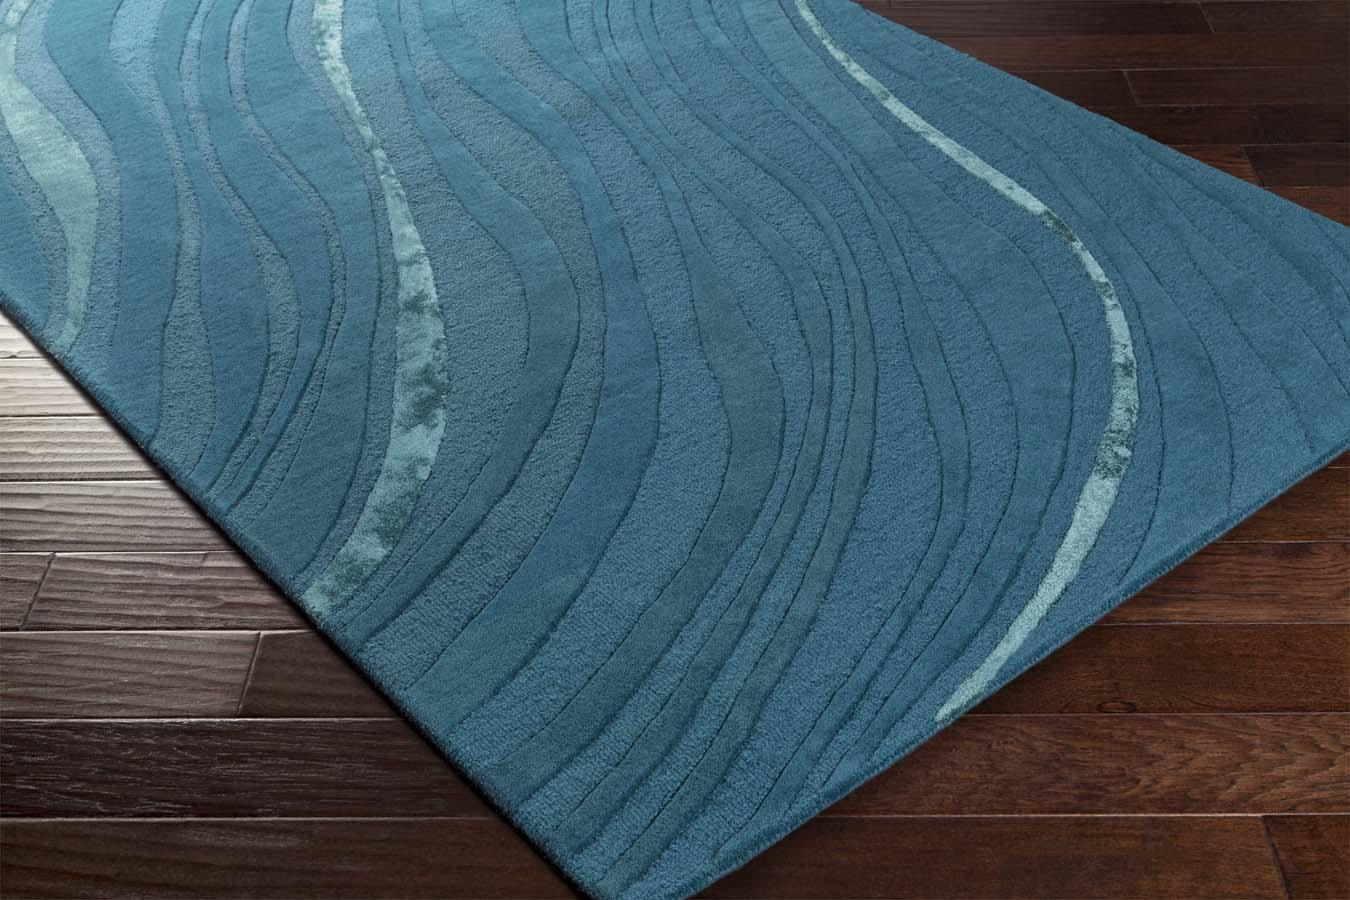 beab ellaej chip joanna magnolia rug products blue ella rose rugs dark gaines